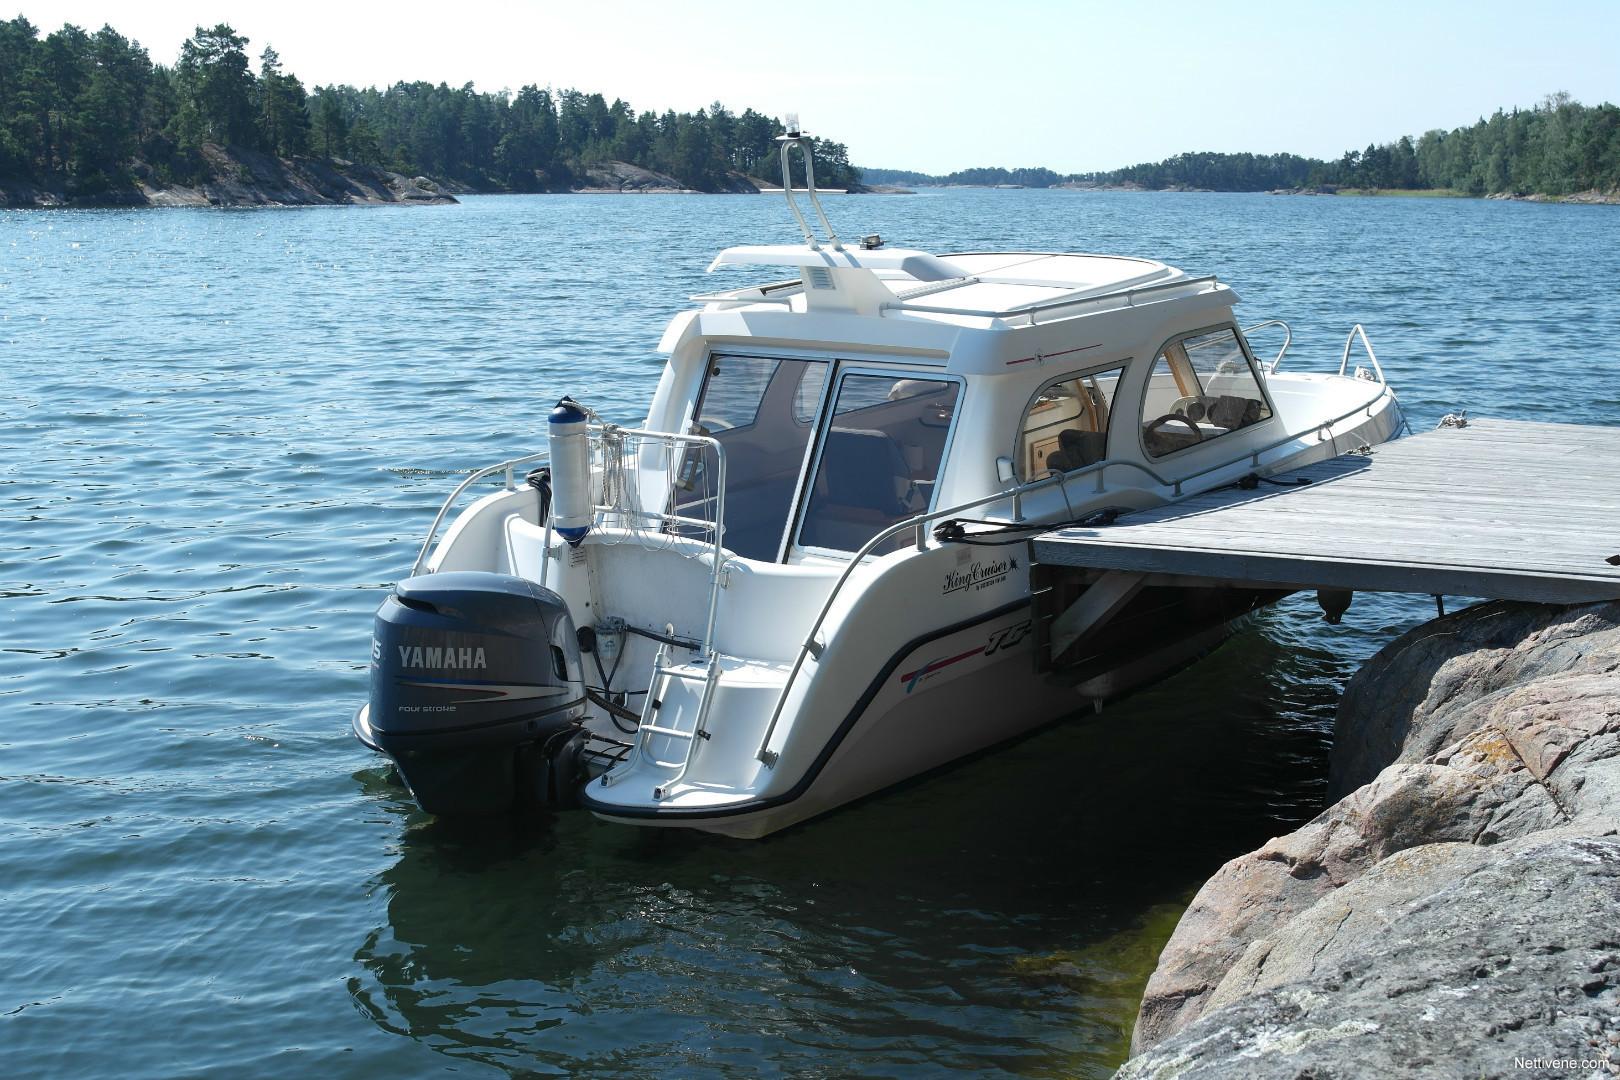 Tg 7200 King Cruiser Motor Boat 2003 Inkoo Nettivene